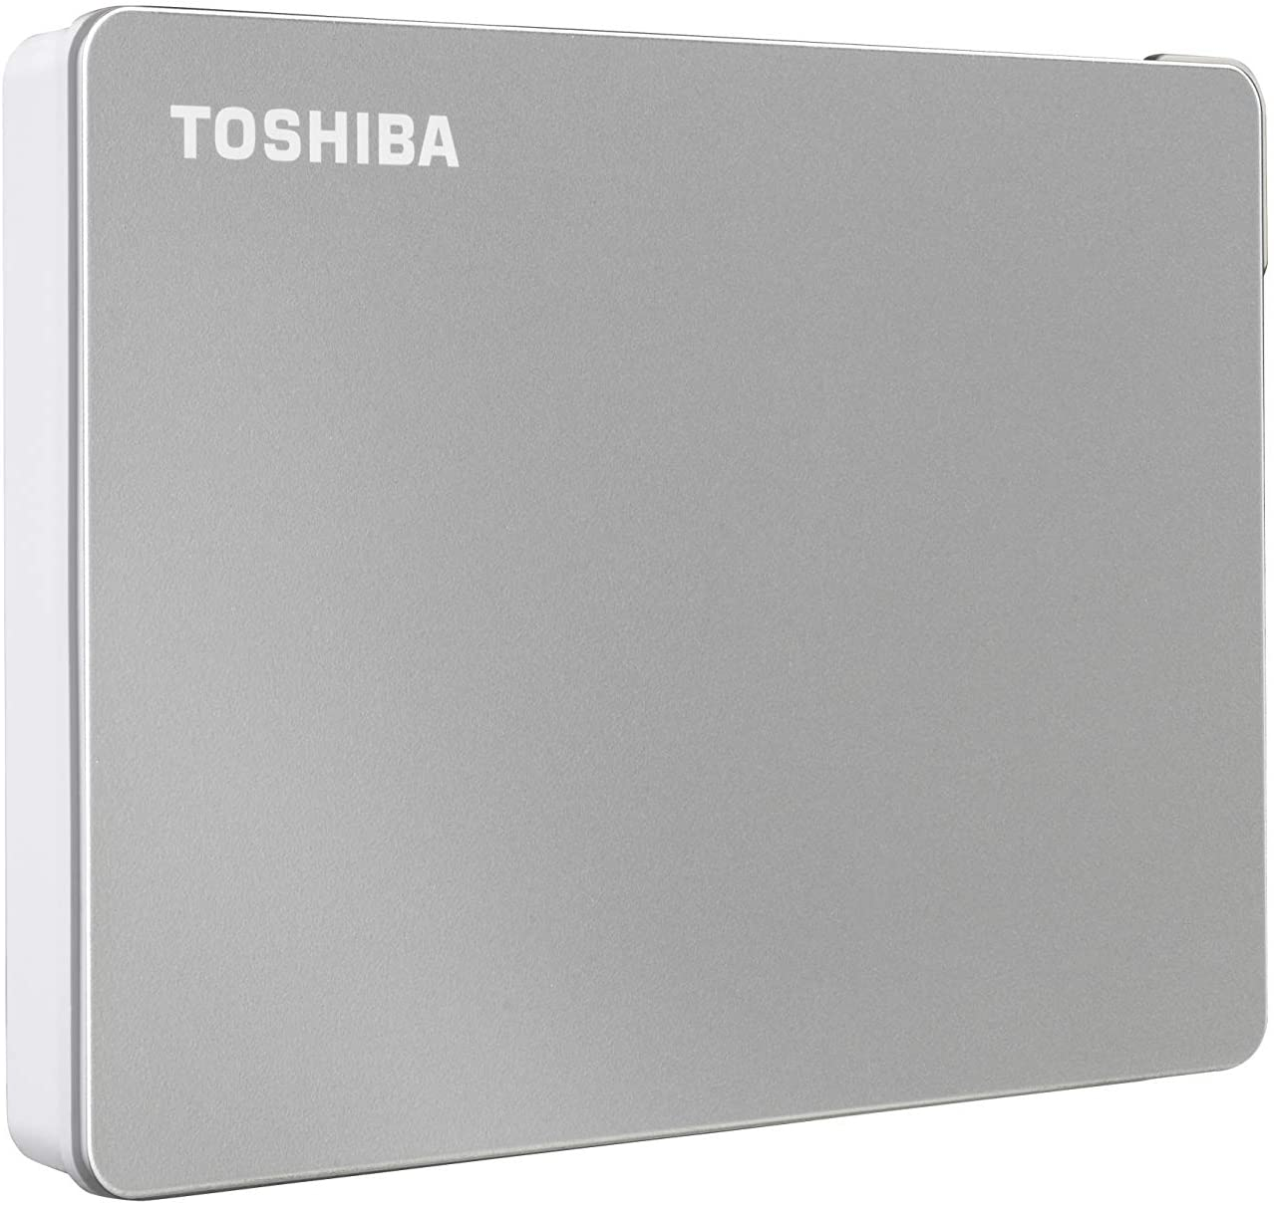 Toshiba Canvio Flex 1TB Portable External Hard Drive USB-C USB 3.0, Silver for PC, Mac, Tablet - HDTX110XSCAA